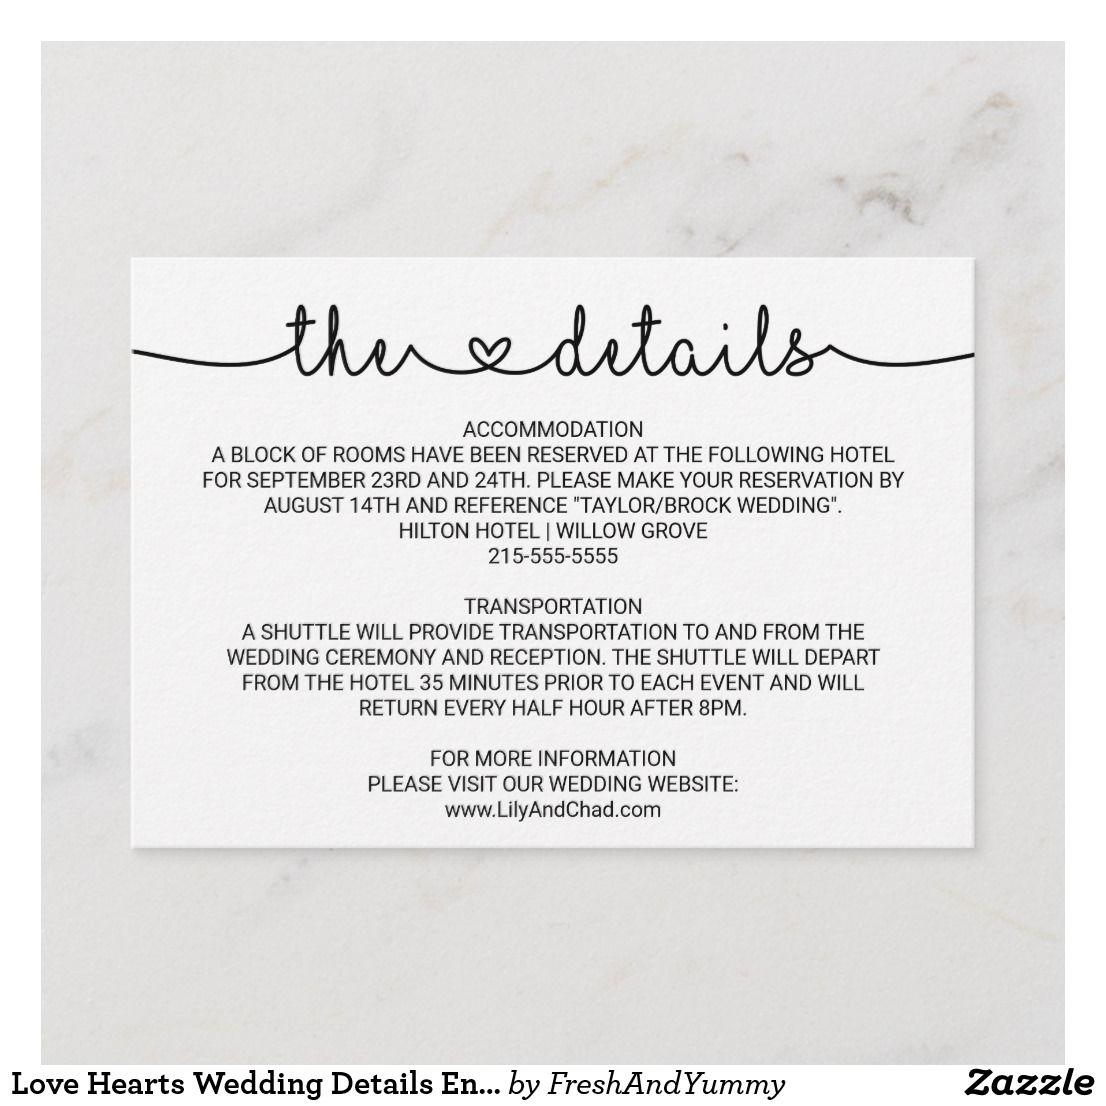 Love Hearts Wedding Details Enclosure Card